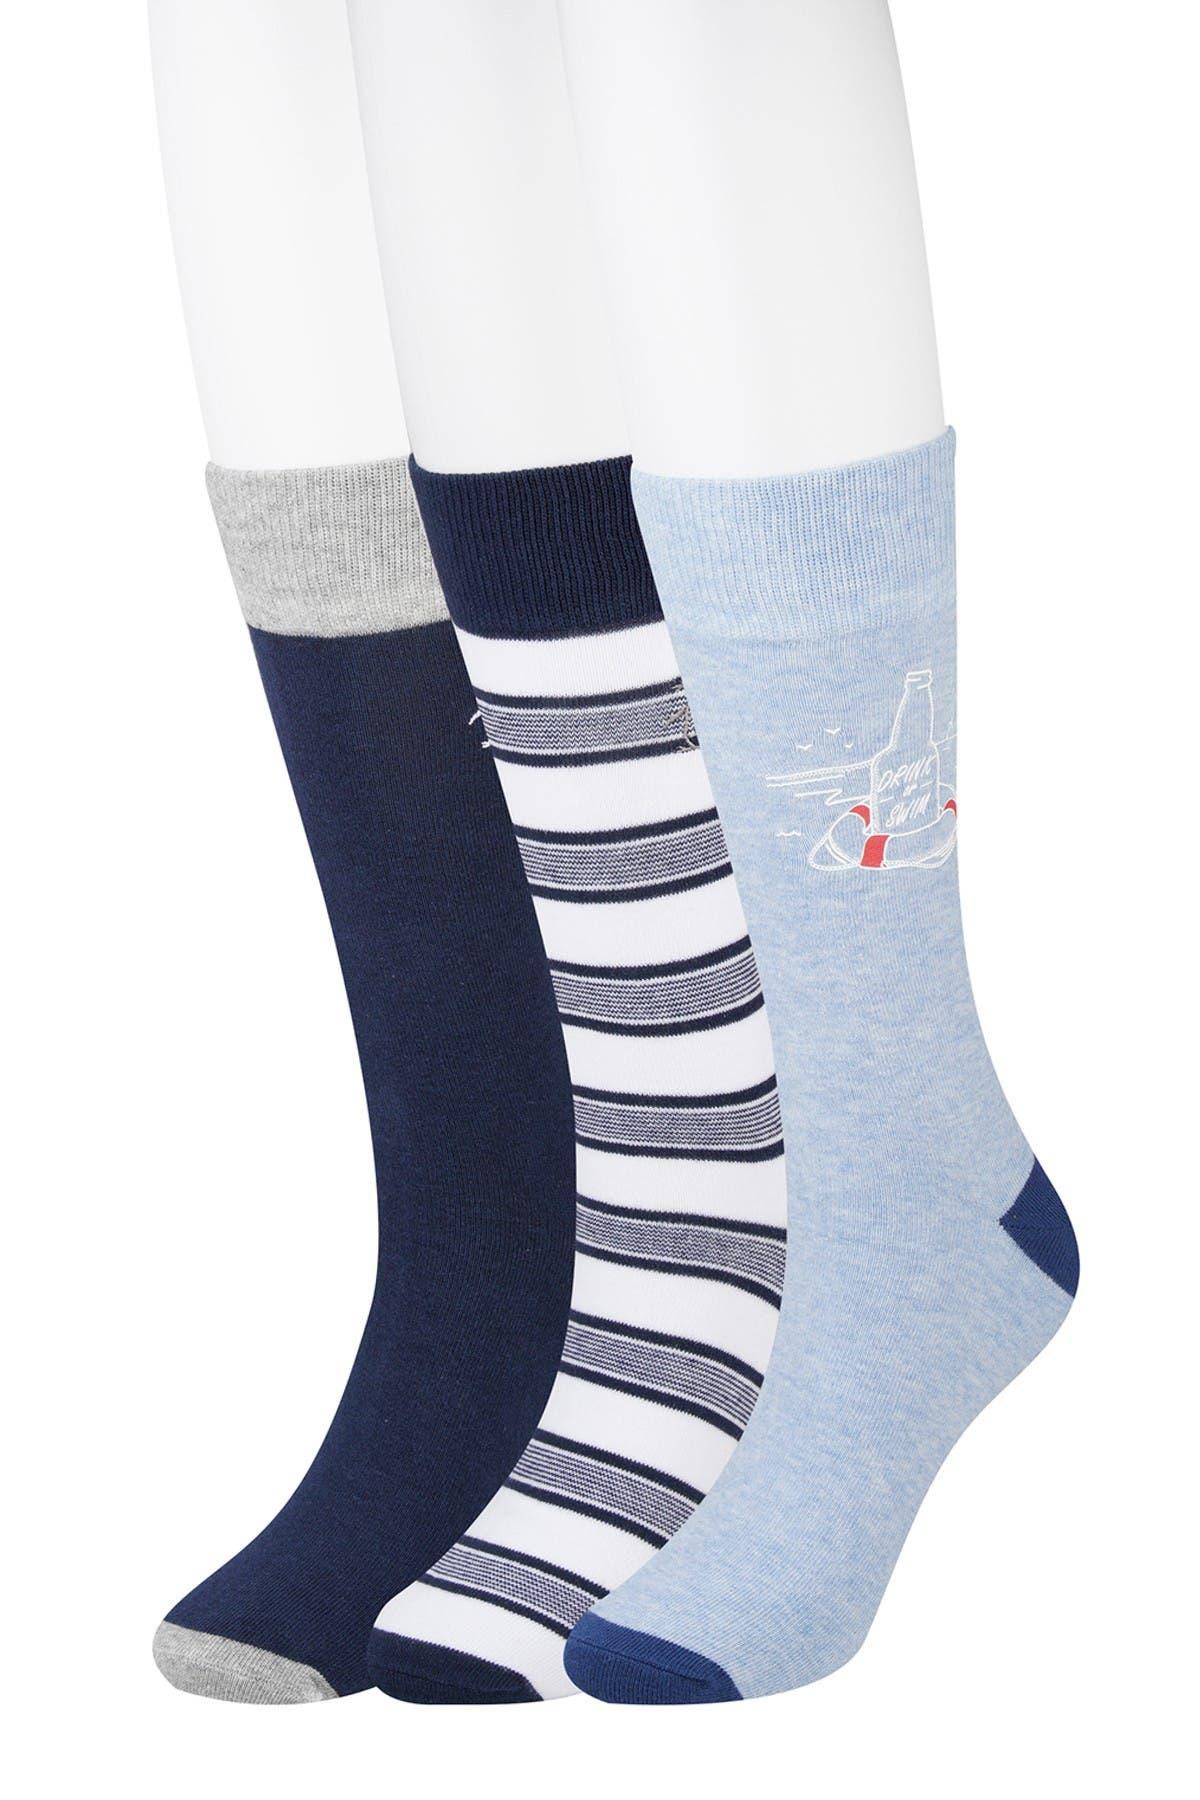 Image of Original Penguin Drink or Swim Crew Socks - Pack of 3